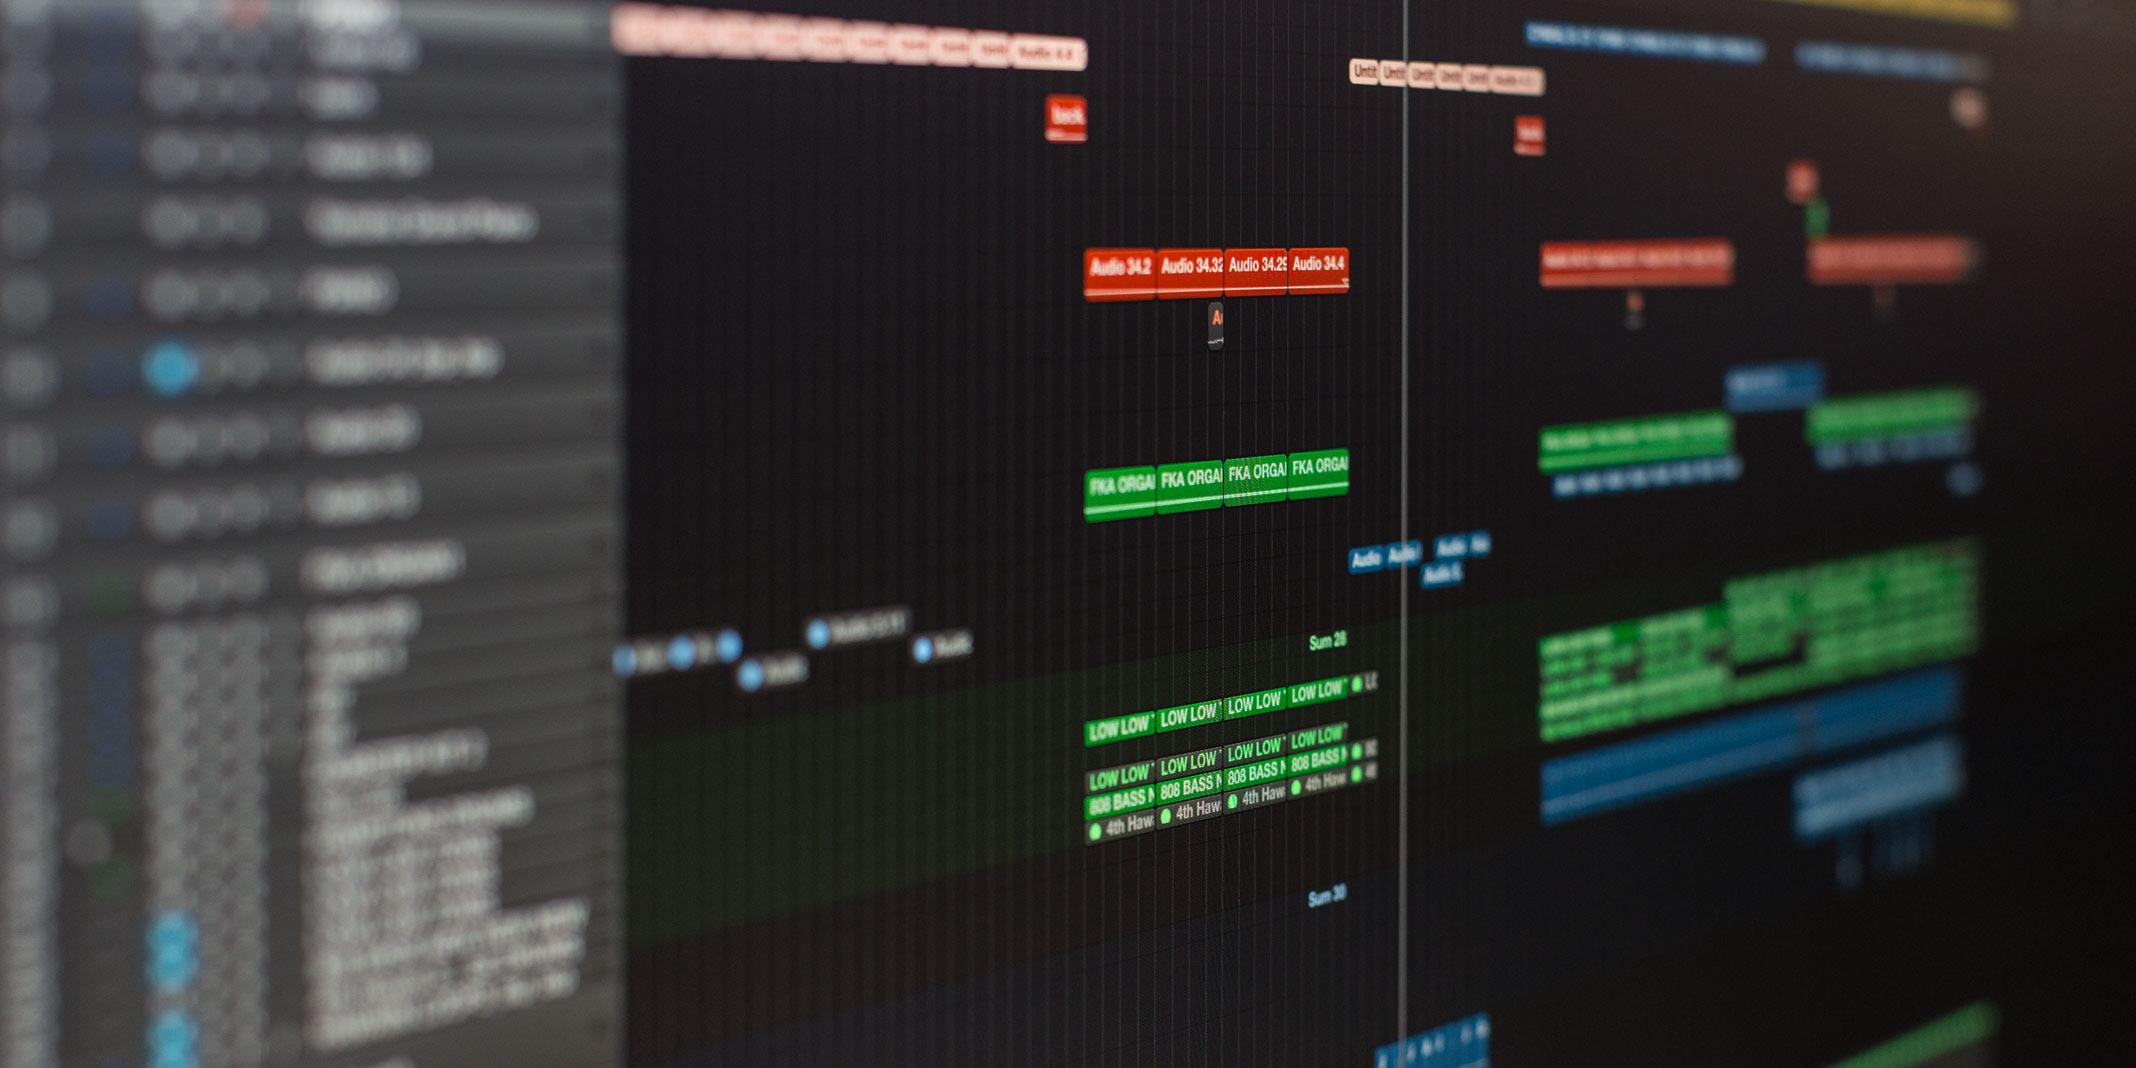 Logic Pro X Timeline